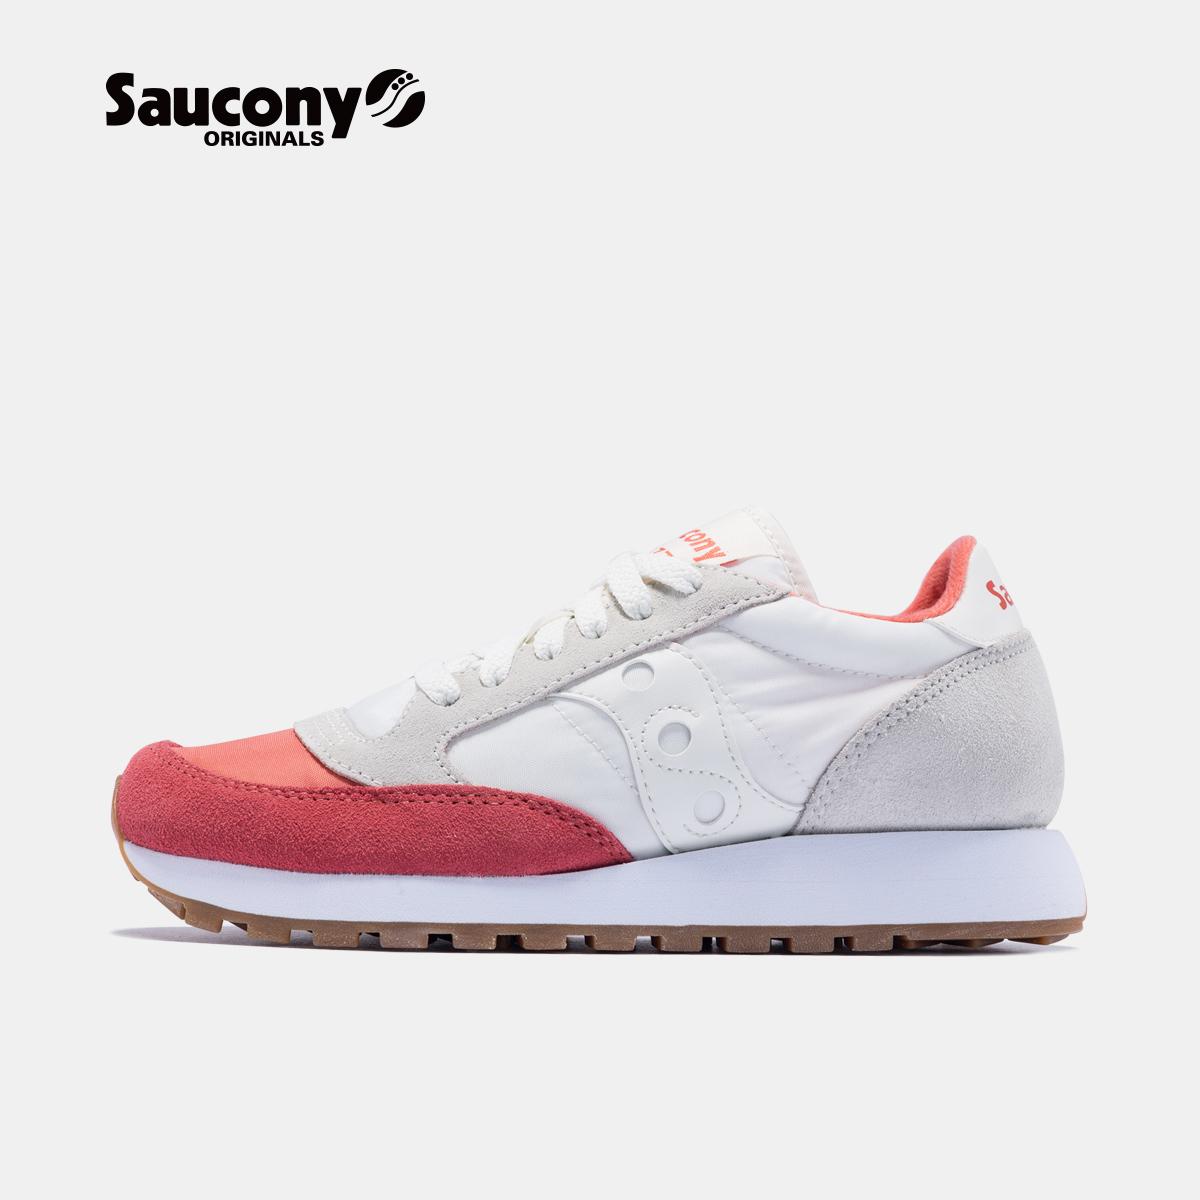 Saucony圣康尼 JAZZ ORIGINAL 复古跑鞋 女子跑步鞋S1044-H